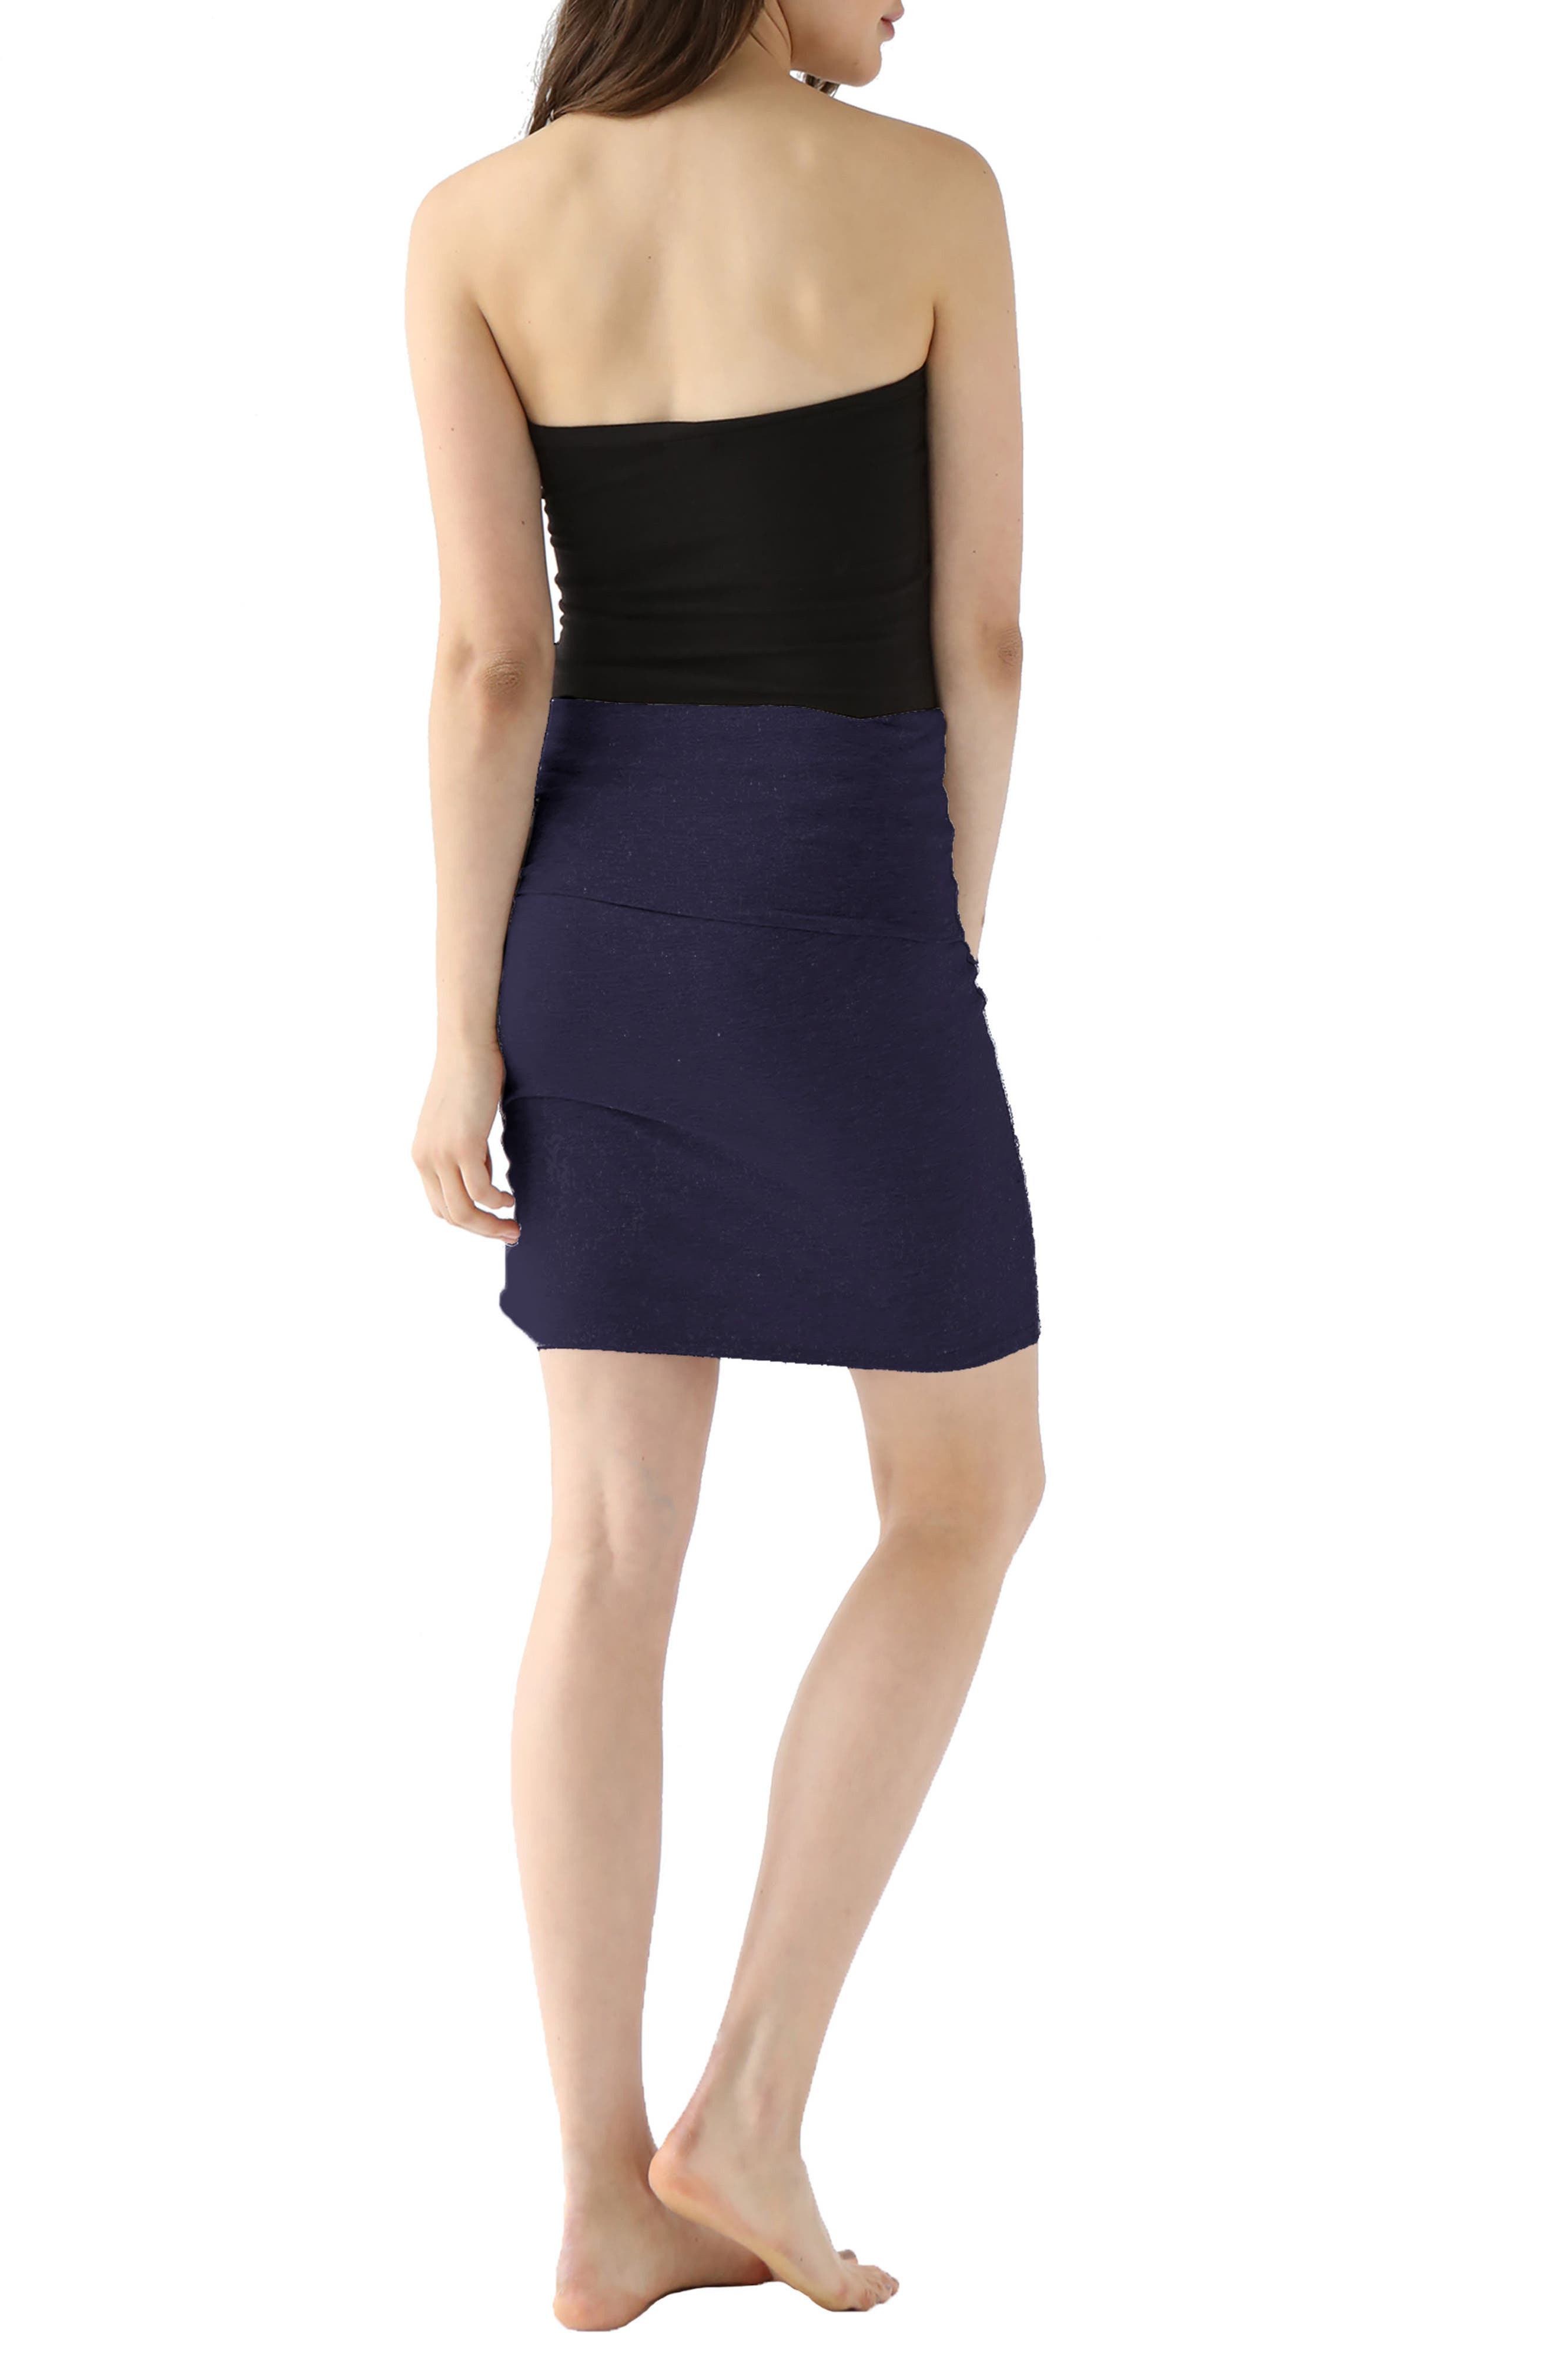 Trina Foldover Stretch Cotton Skirt,                             Alternate thumbnail 2, color,                             Midnight